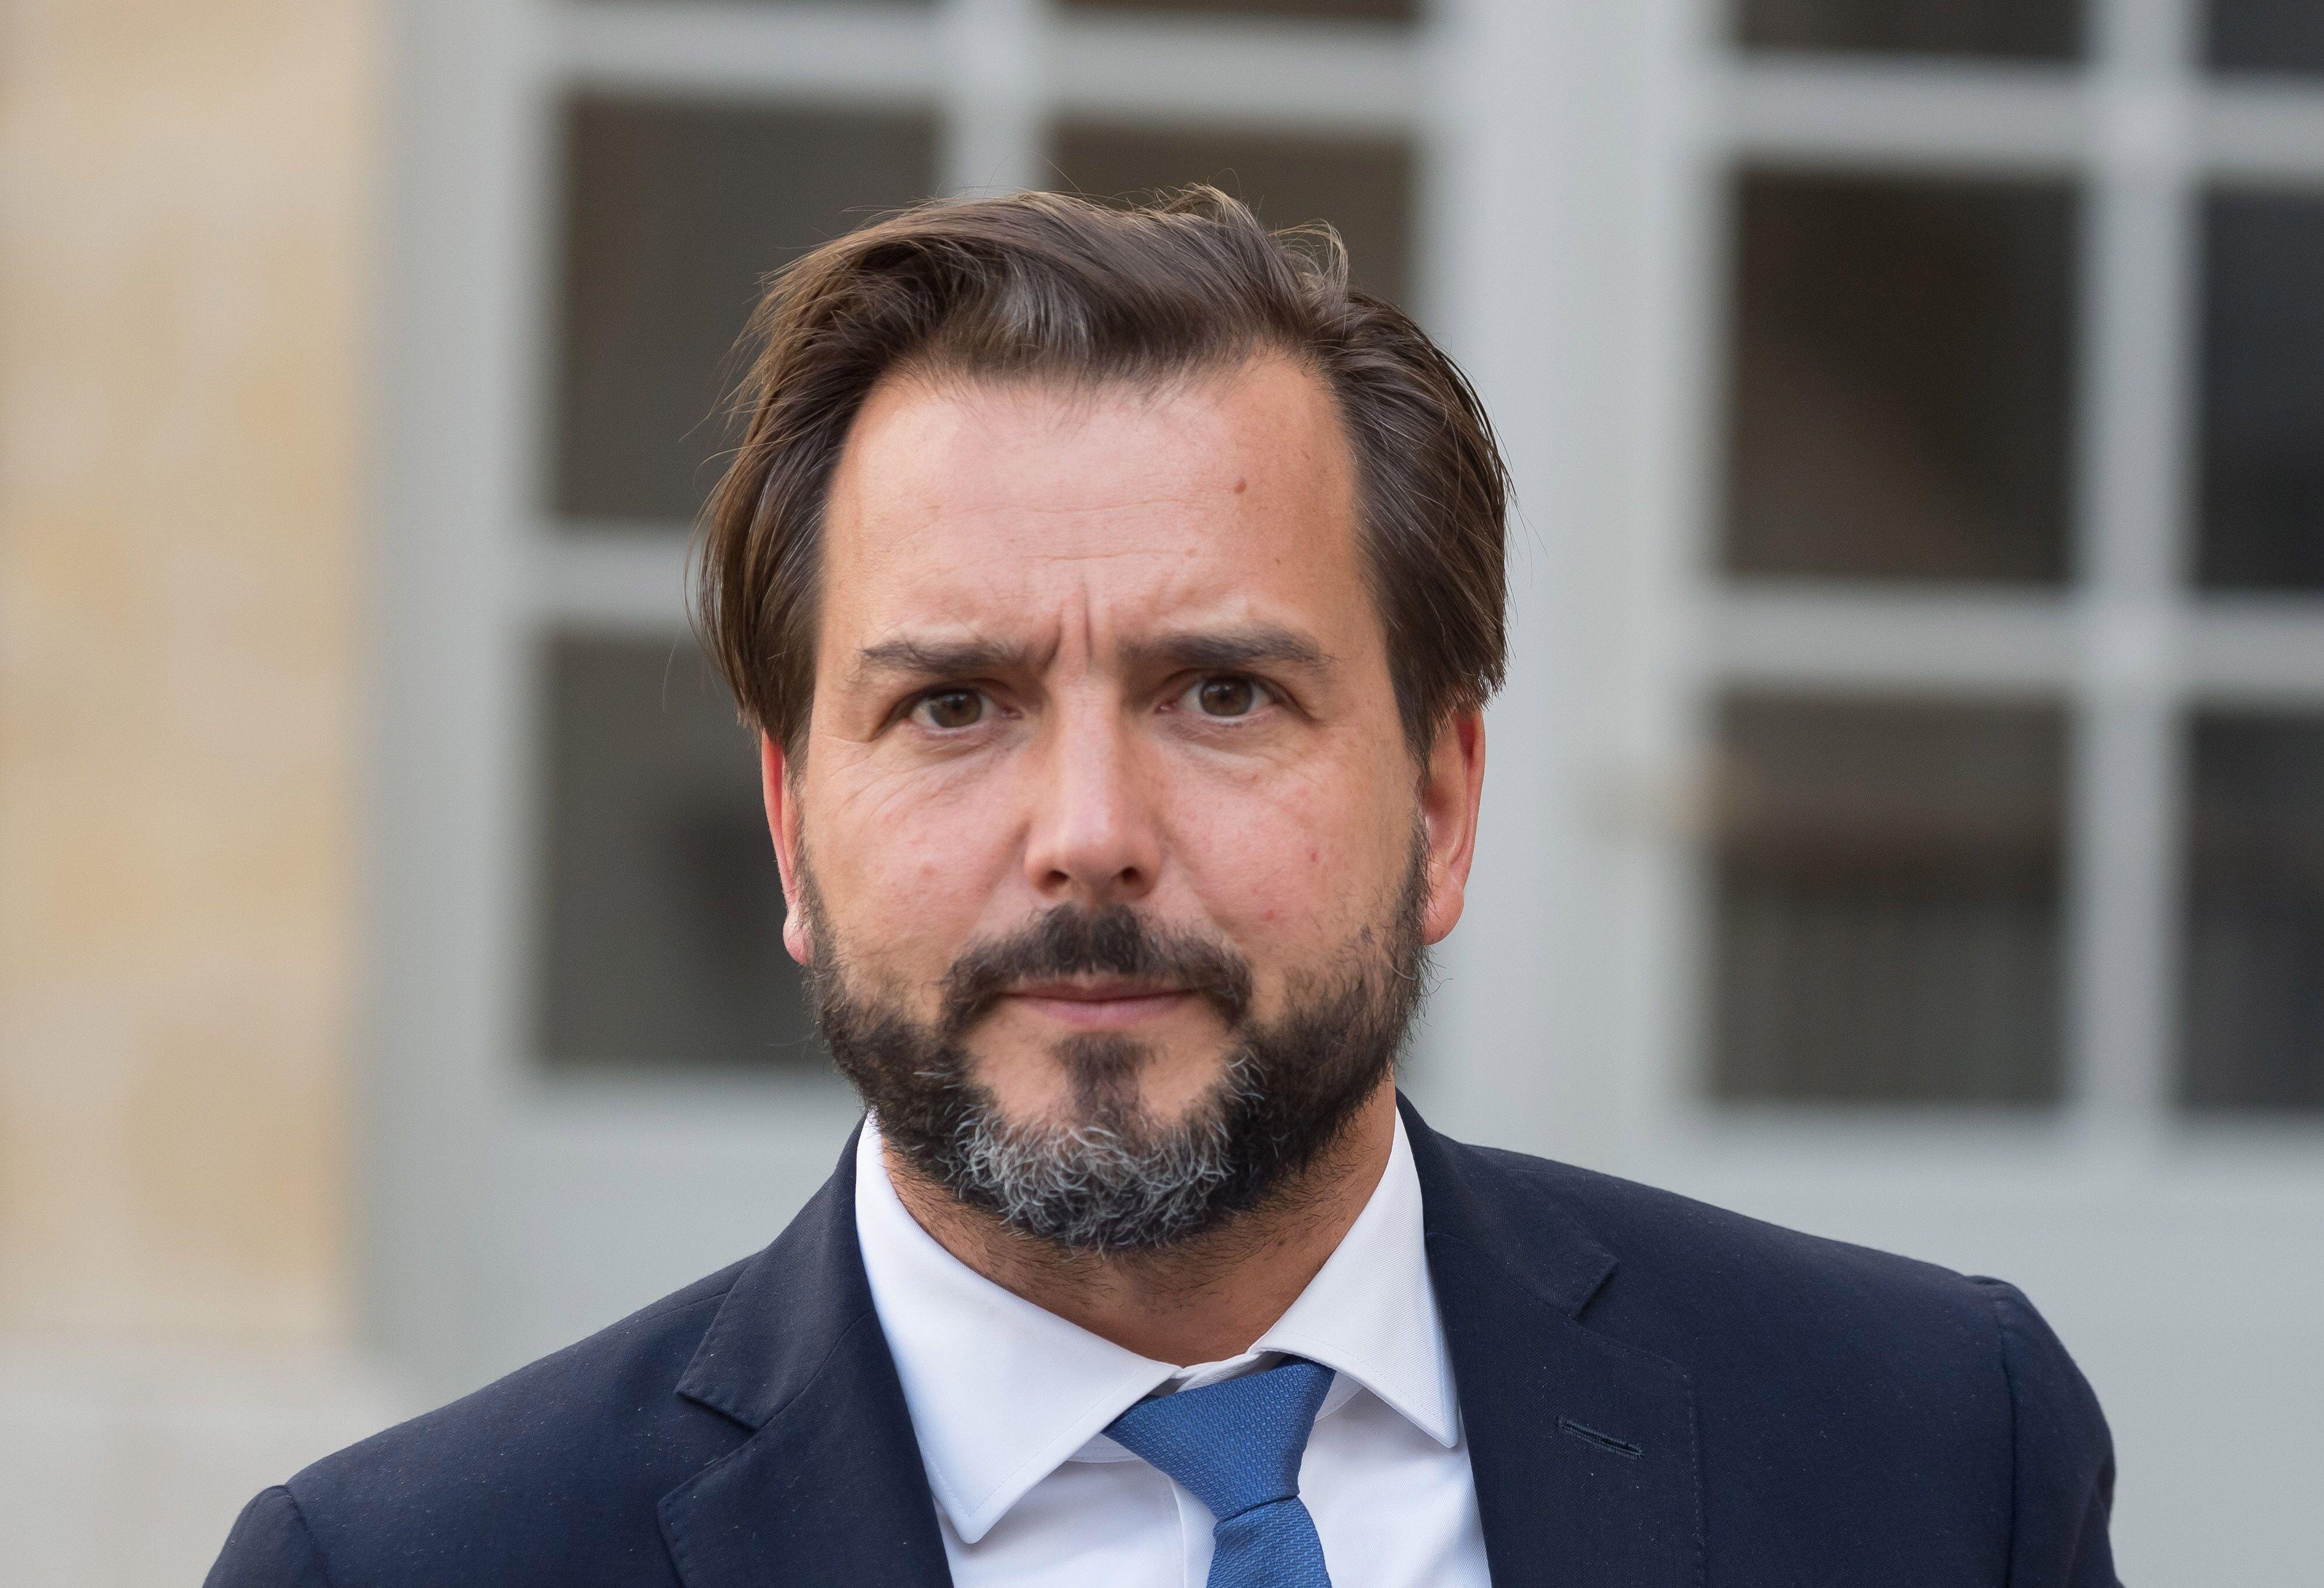 Benoît Ribadeau-Dumas - La biographie de Benoît Ribadeau-Dumas avec Gala.fr